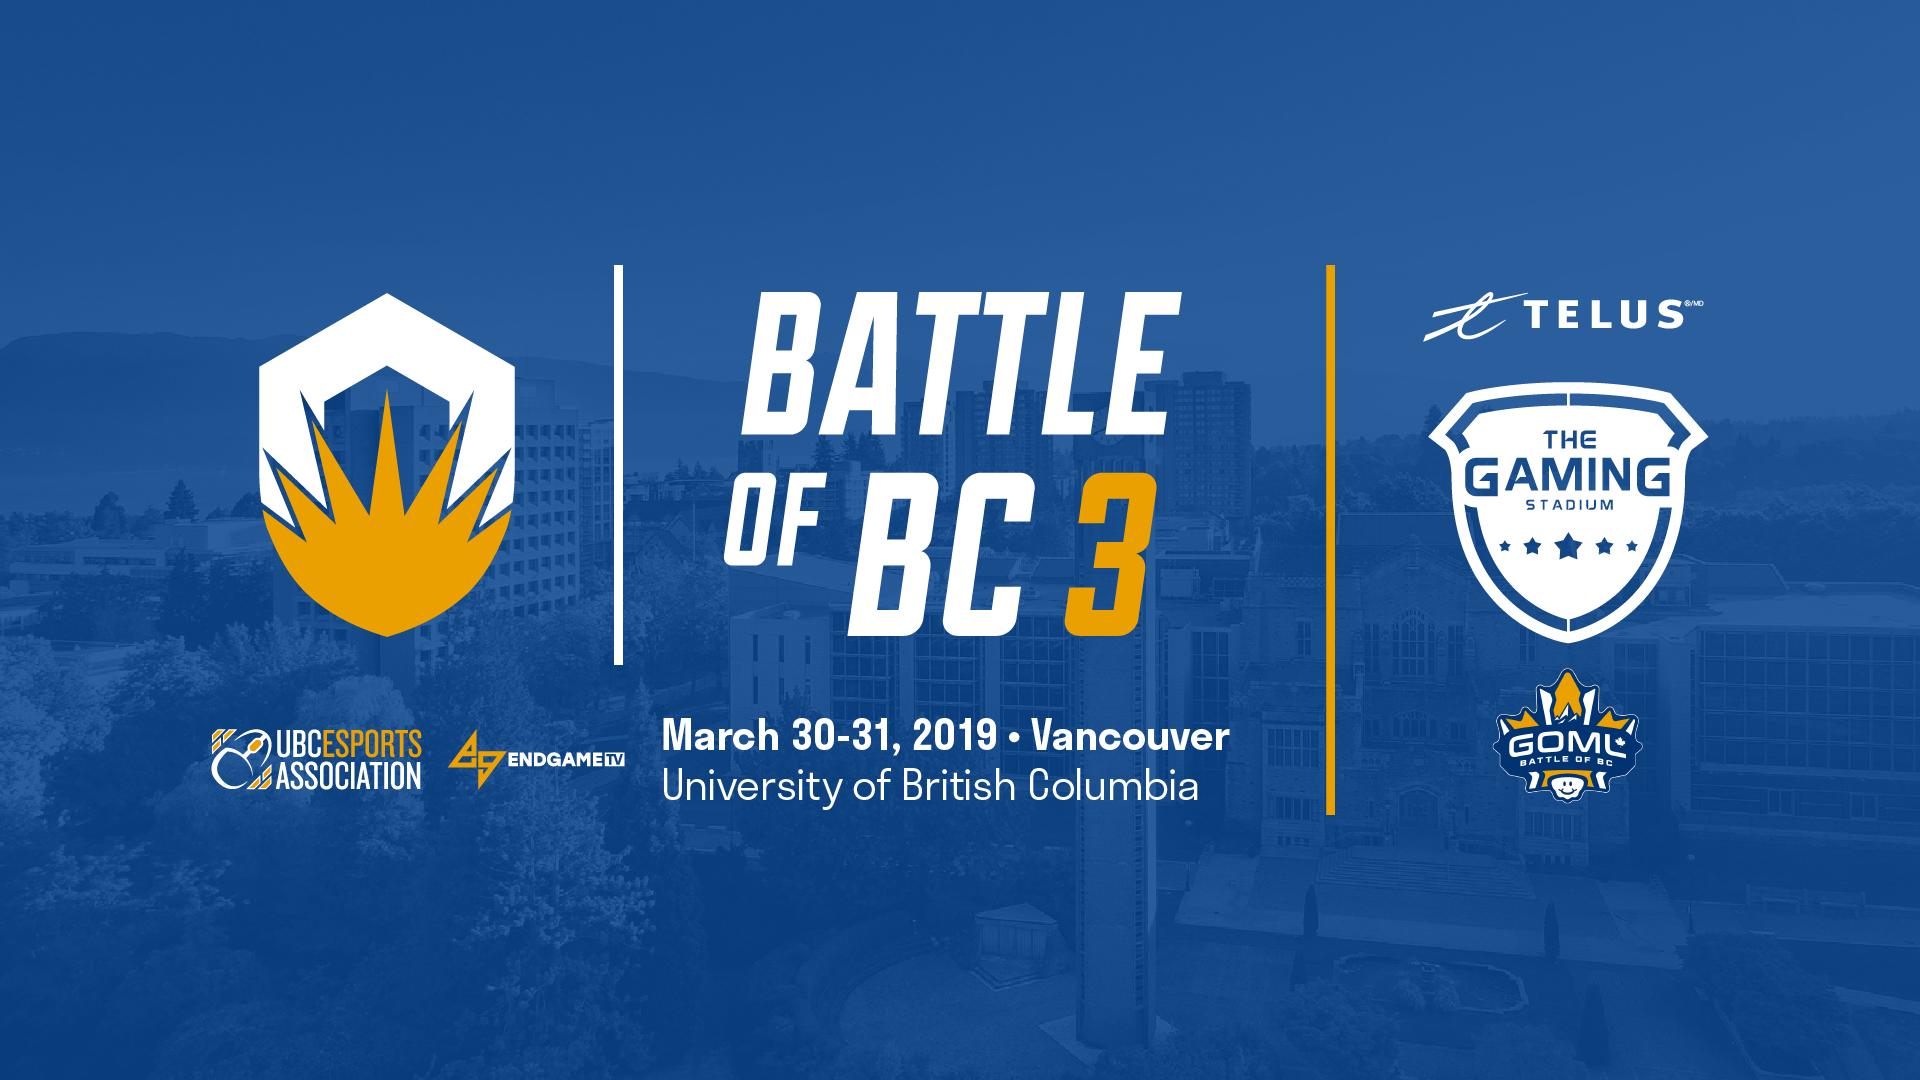 Battle Of Bc 3 Details